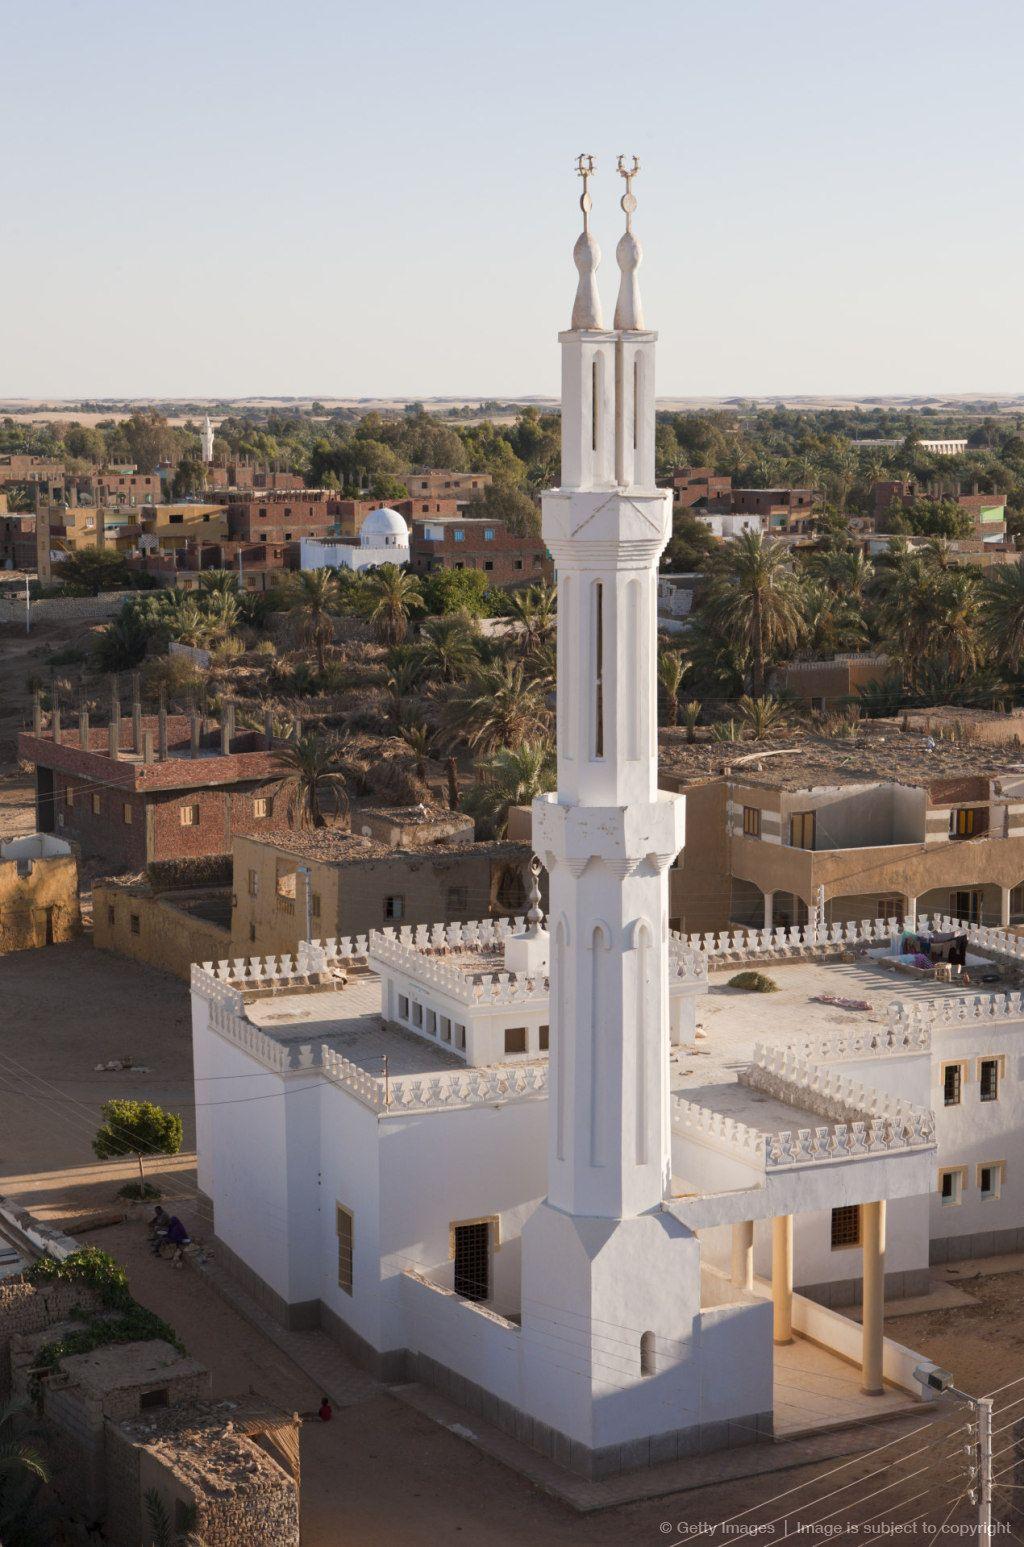 View On Old Town El Qasr In Dakhla Oasis Libyan Desert